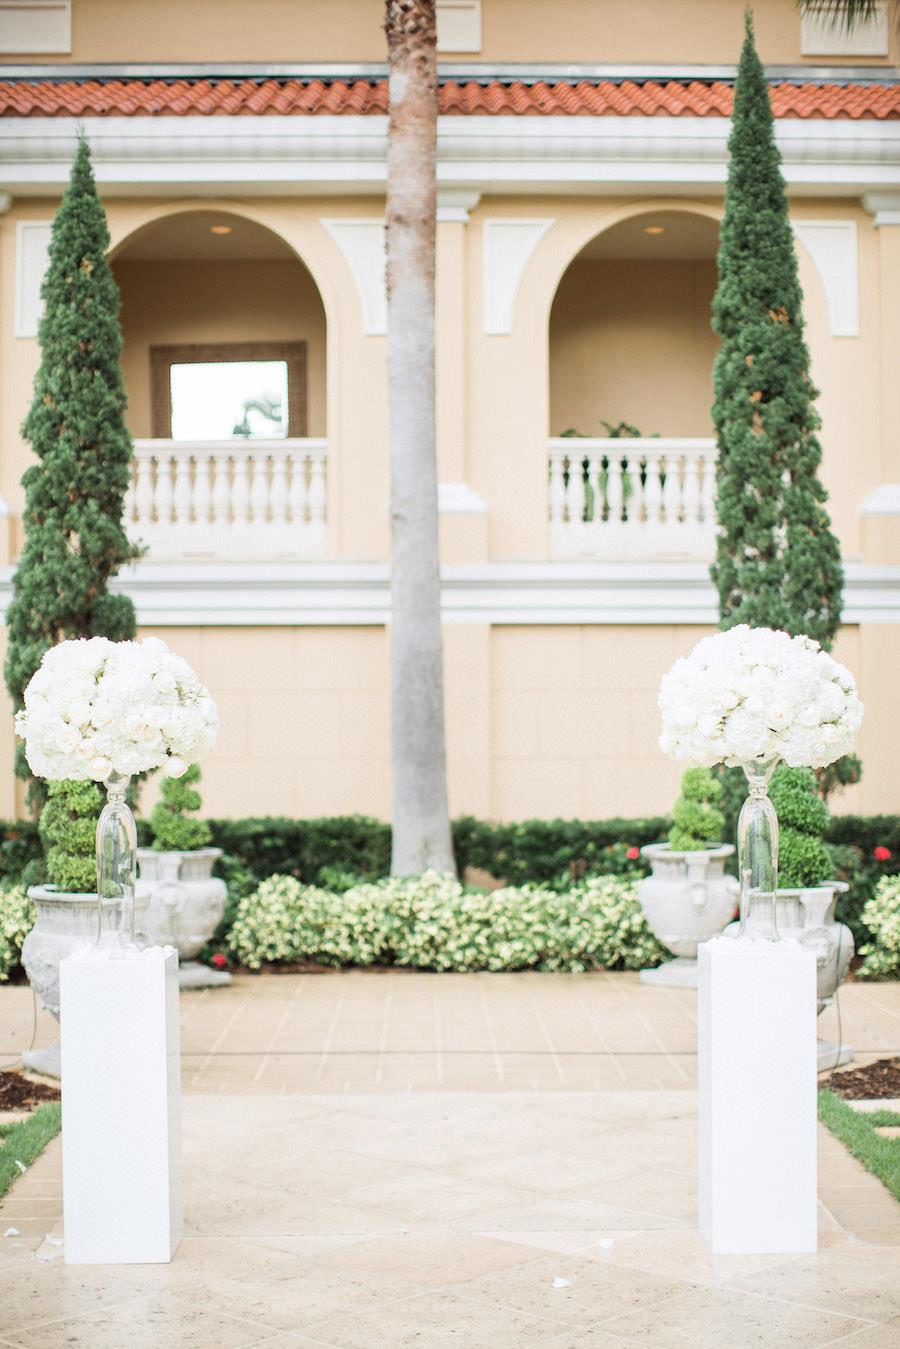 Elegant, Outdoor Wedding Ceremony with Tall White Centerpieces on White Pedestals   Sarasota Hotel Garden Wedding Venue Ritz Carlton